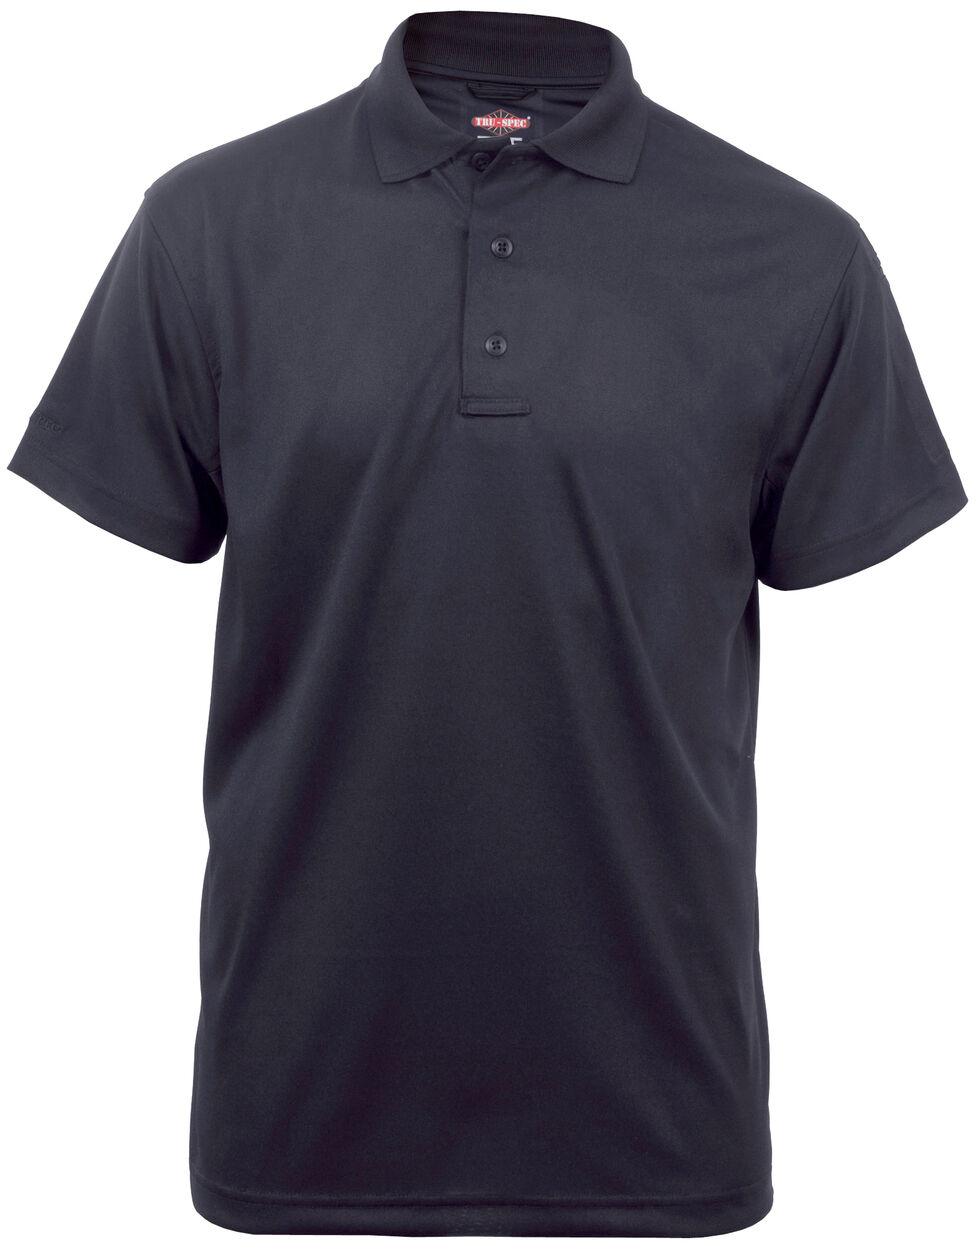 Tru-Spec Men's 24-7 Series Performance Polo Shirt, Black, hi-res